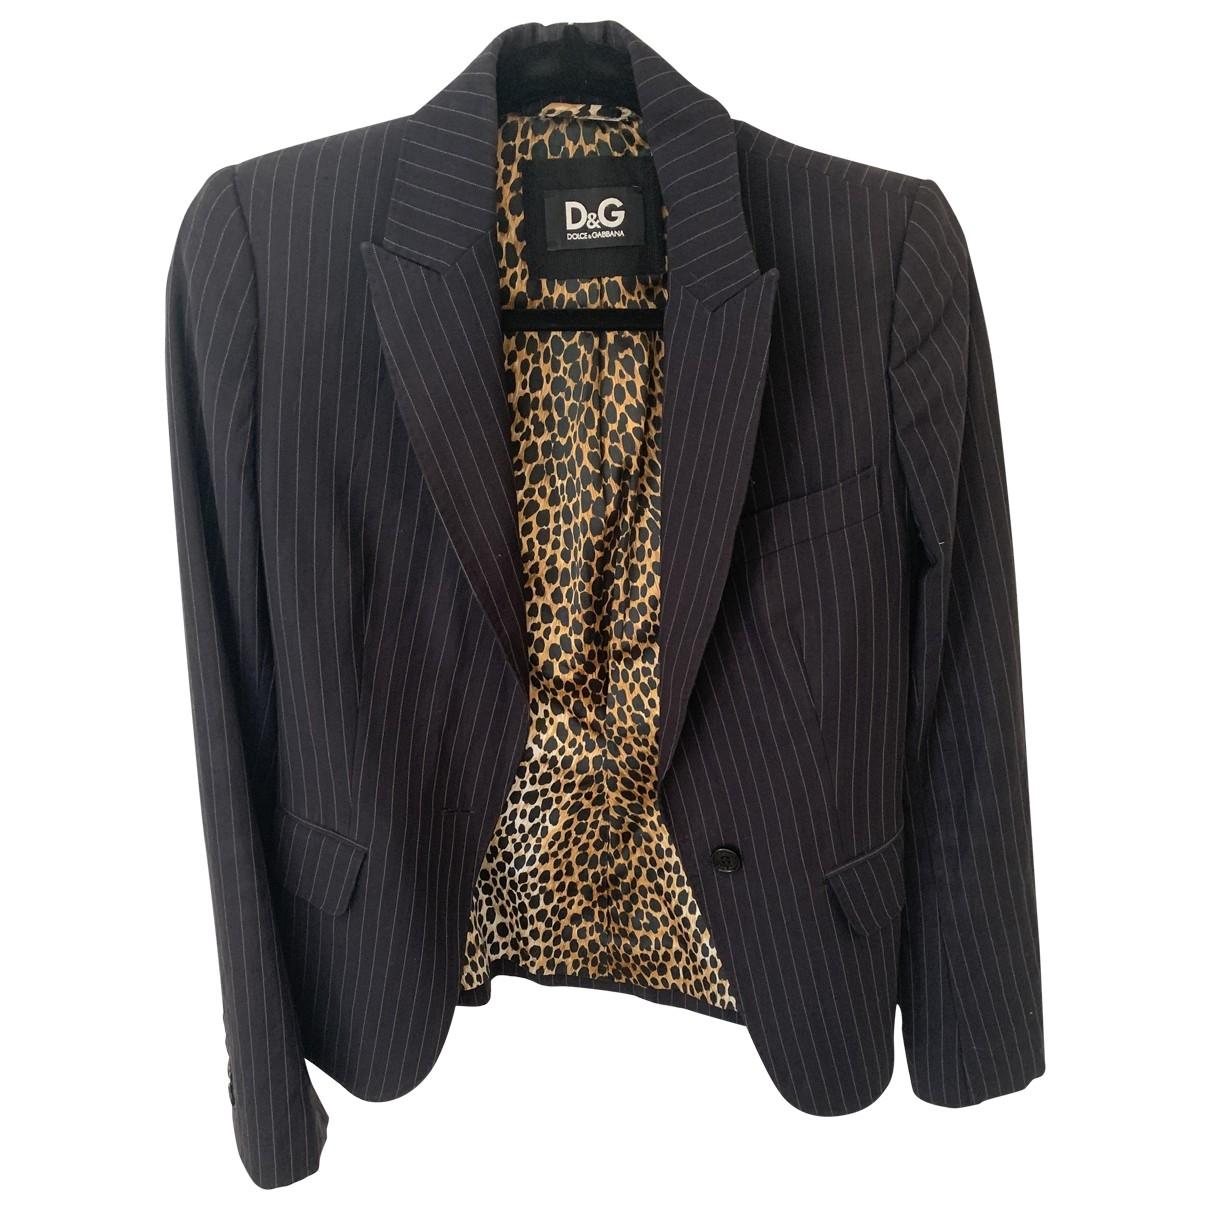 D&g \N Black Wool jacket for Women 38 FR